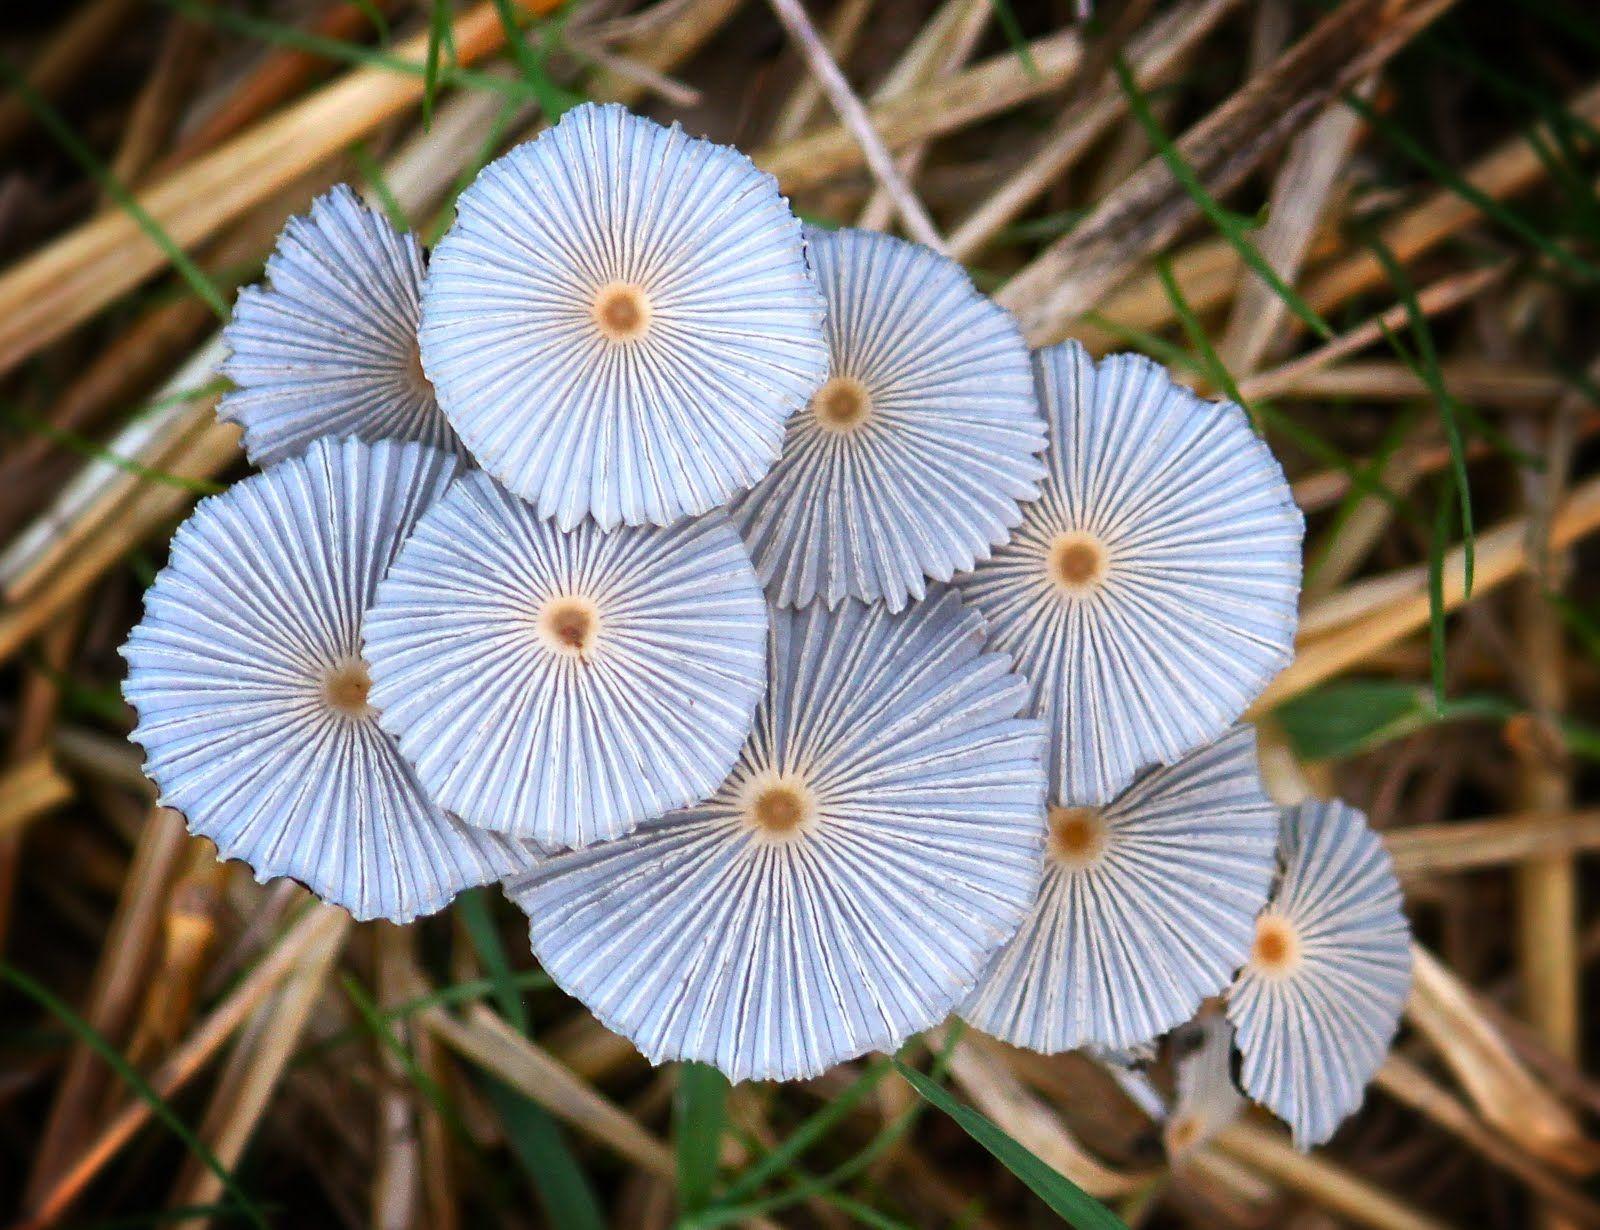 Taylor Lockwoods MUSHROOM PHOTO INDEX Googleda Ara MANTARLAR - Photographer captures the beautiful diversity of australias fungi